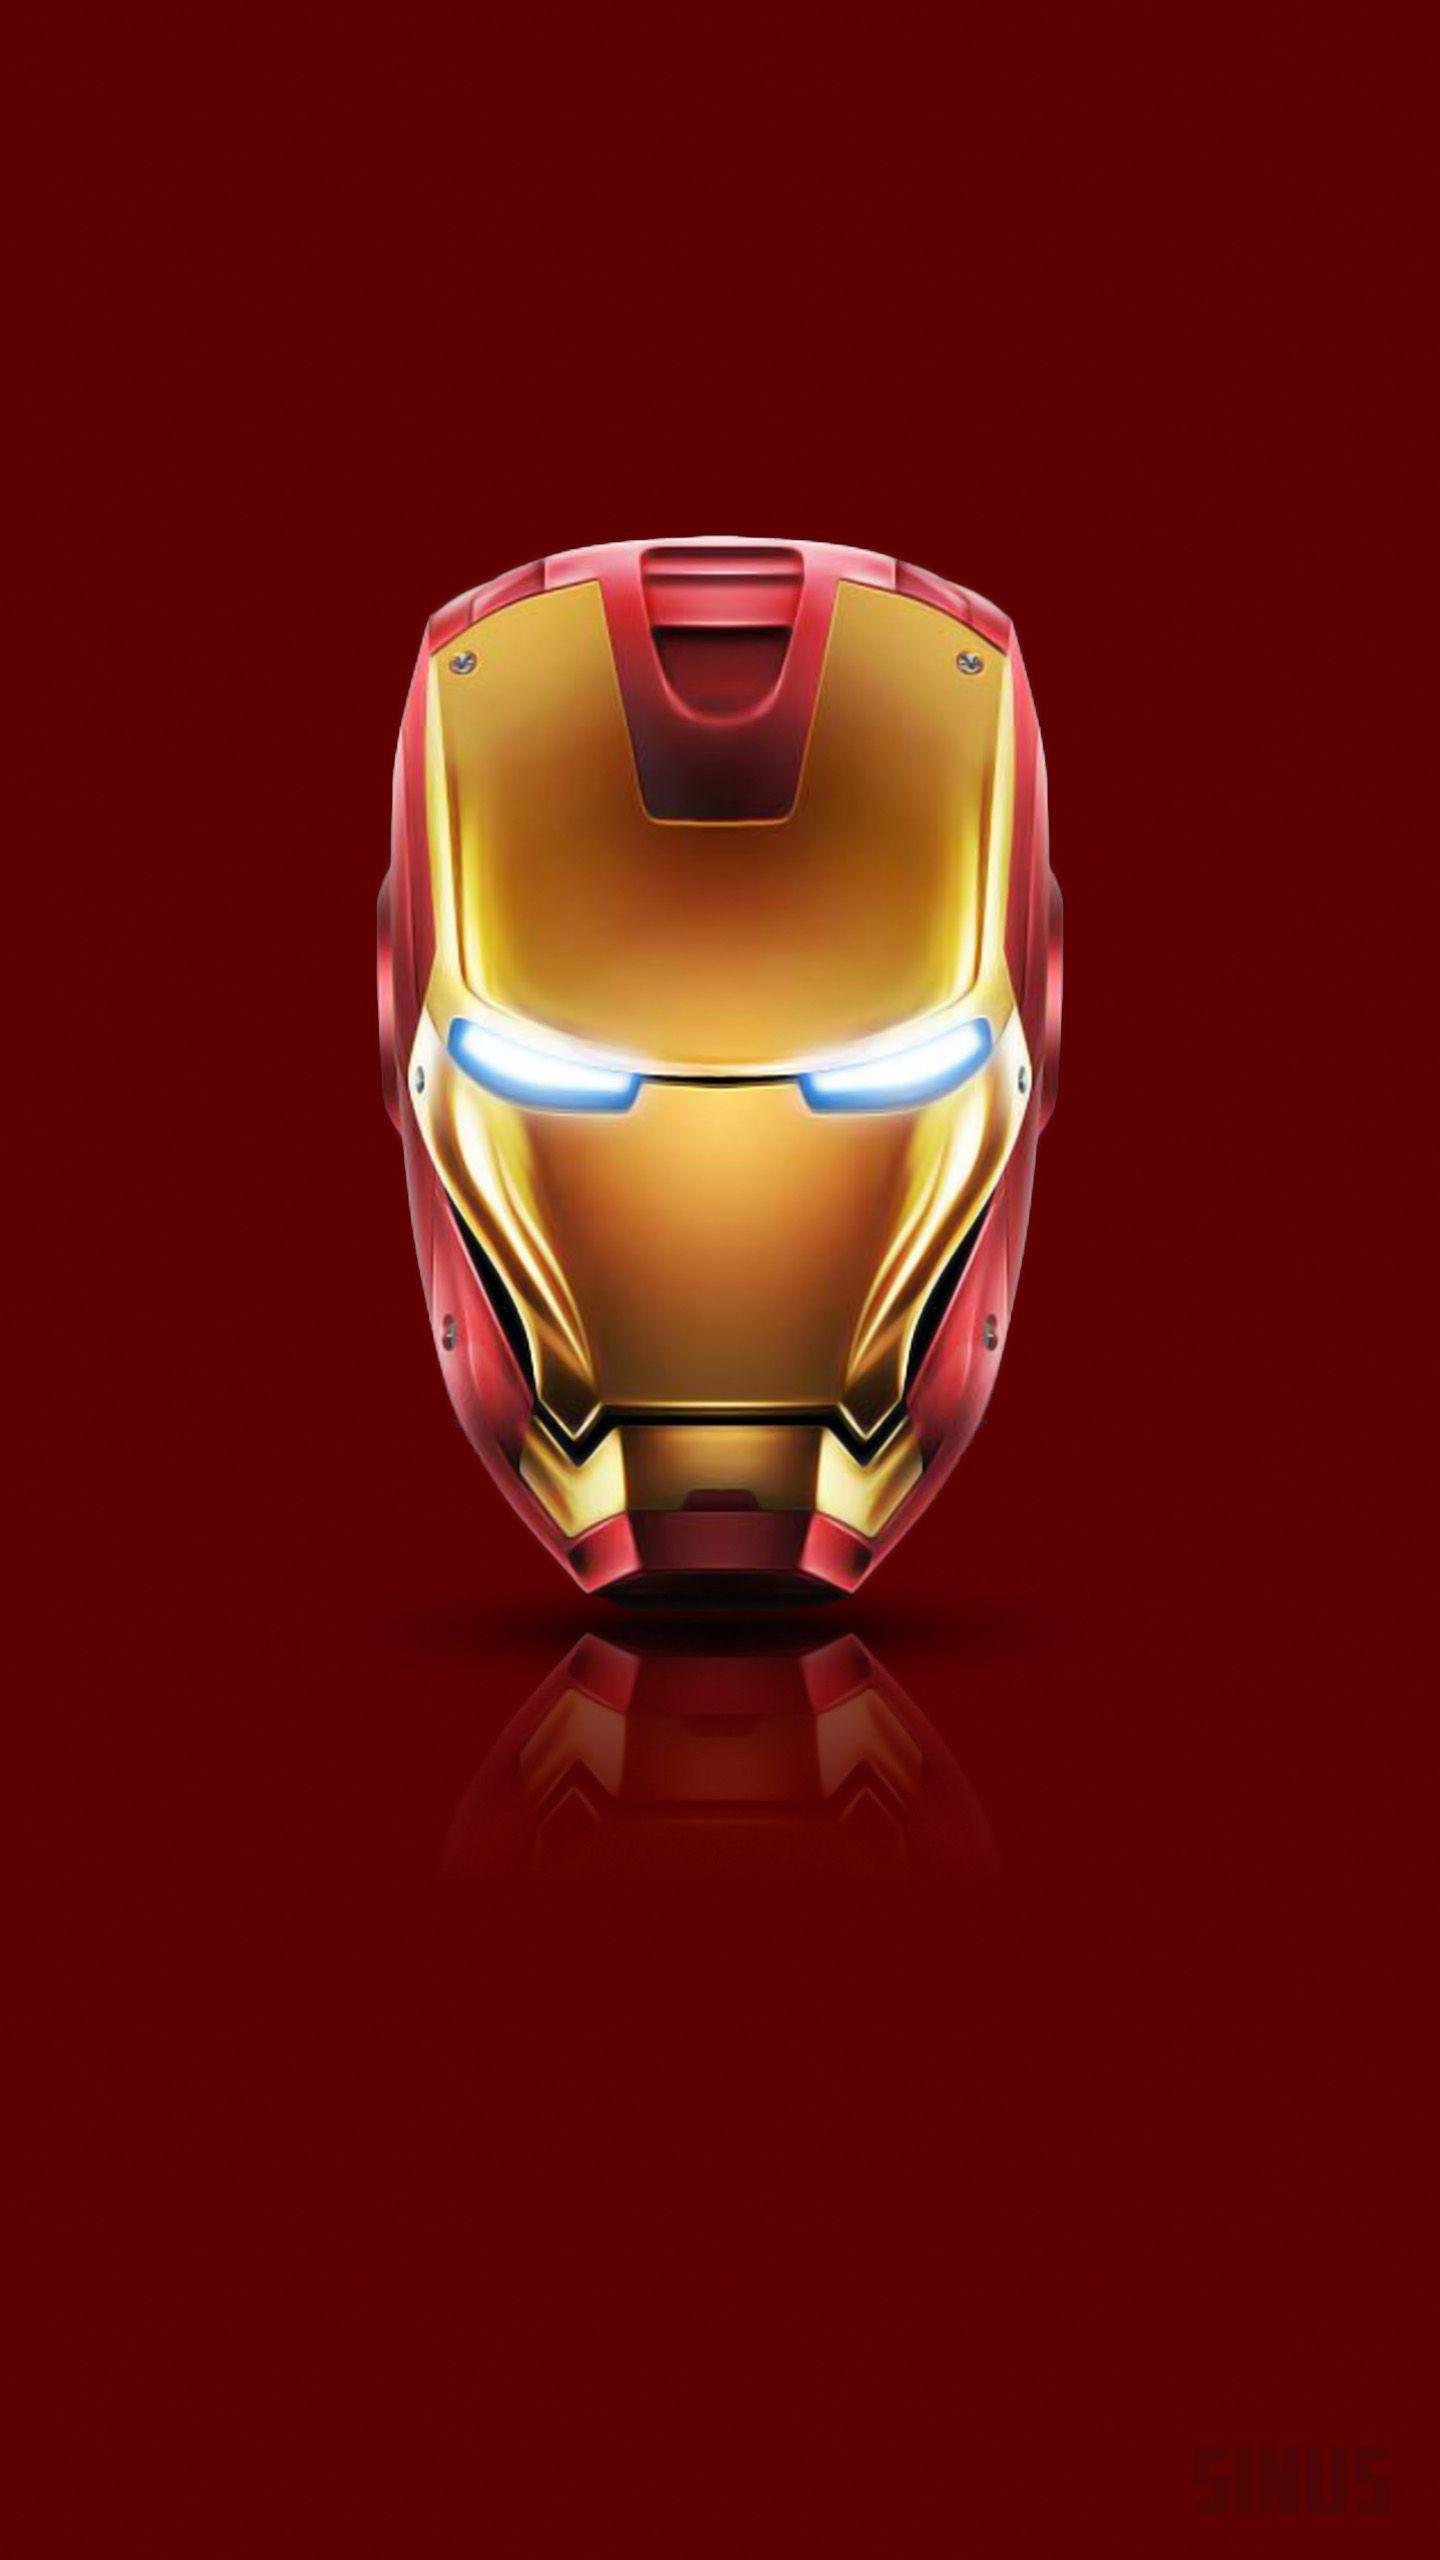 ironman red bg, iron mask, mirror effect, iron man mobile background